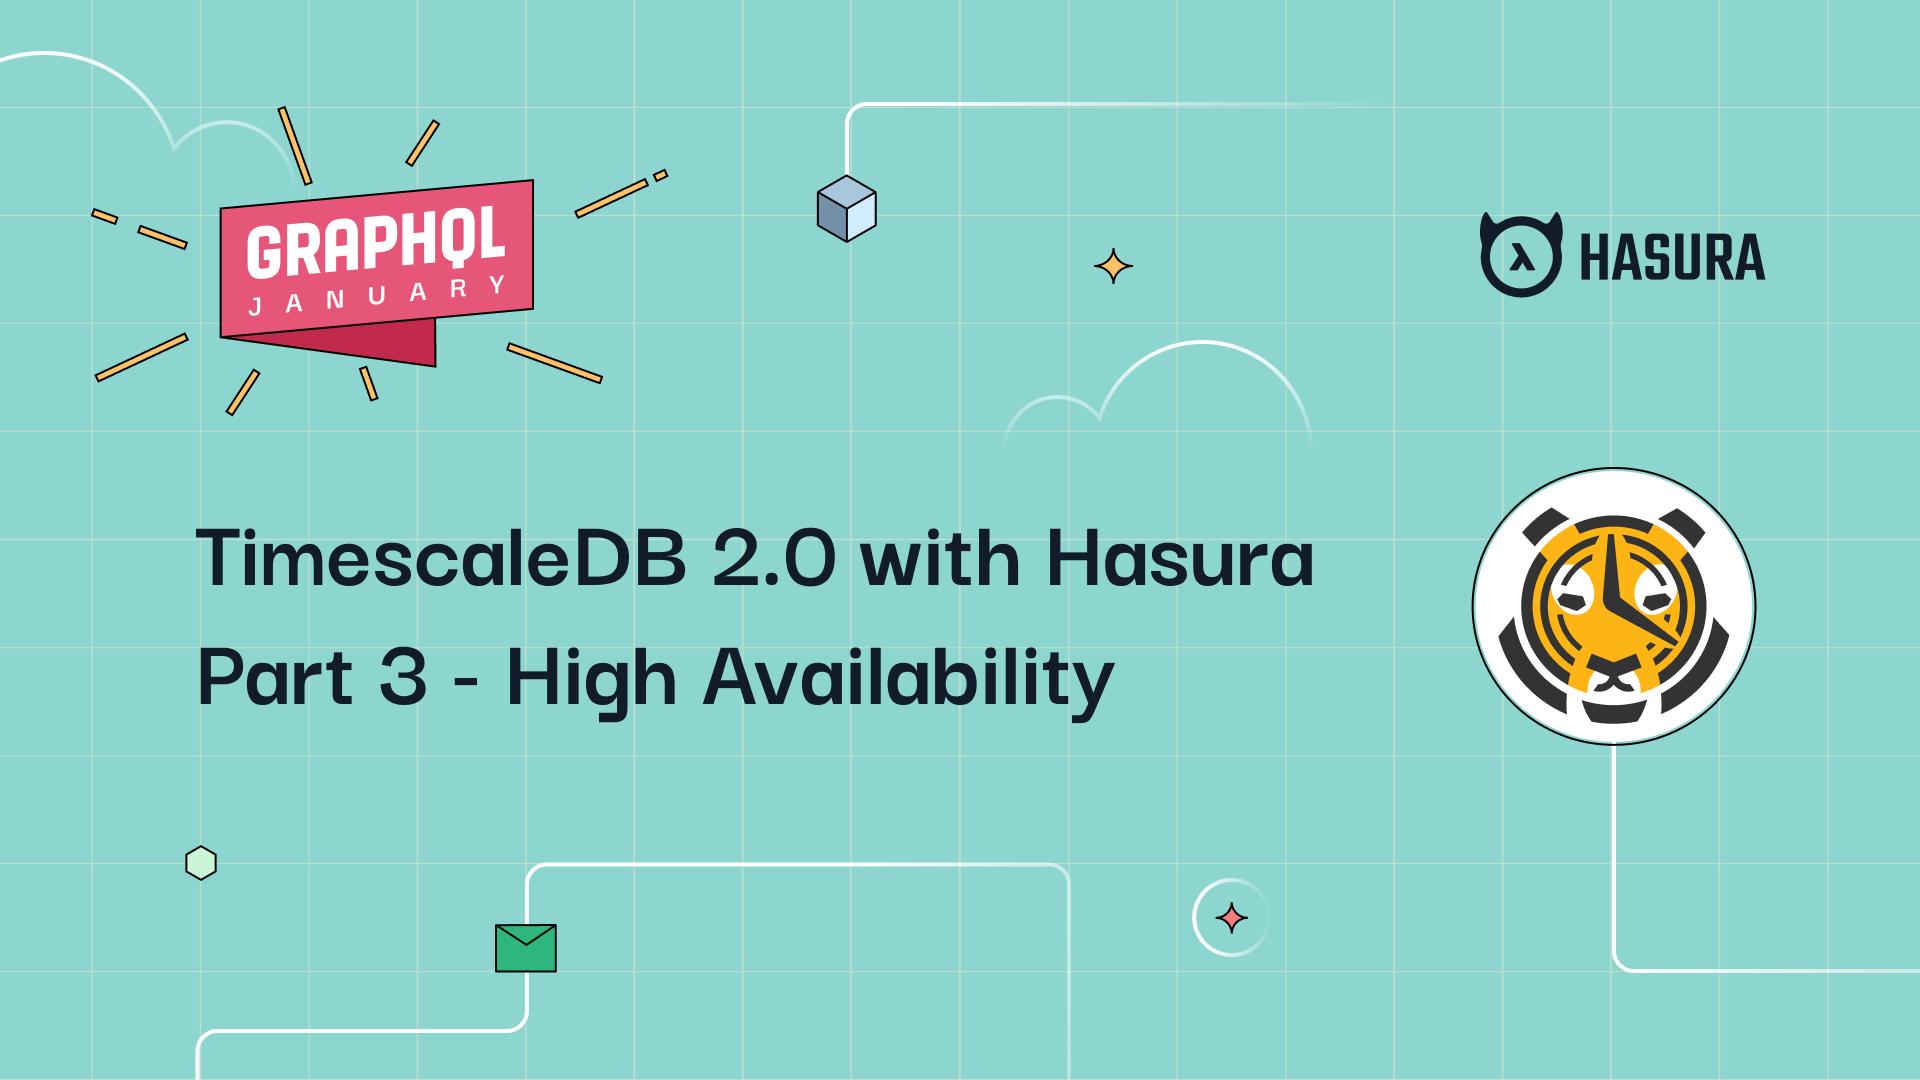 TimescaleDB 2.0 with Hasura Part 3 - High Availability